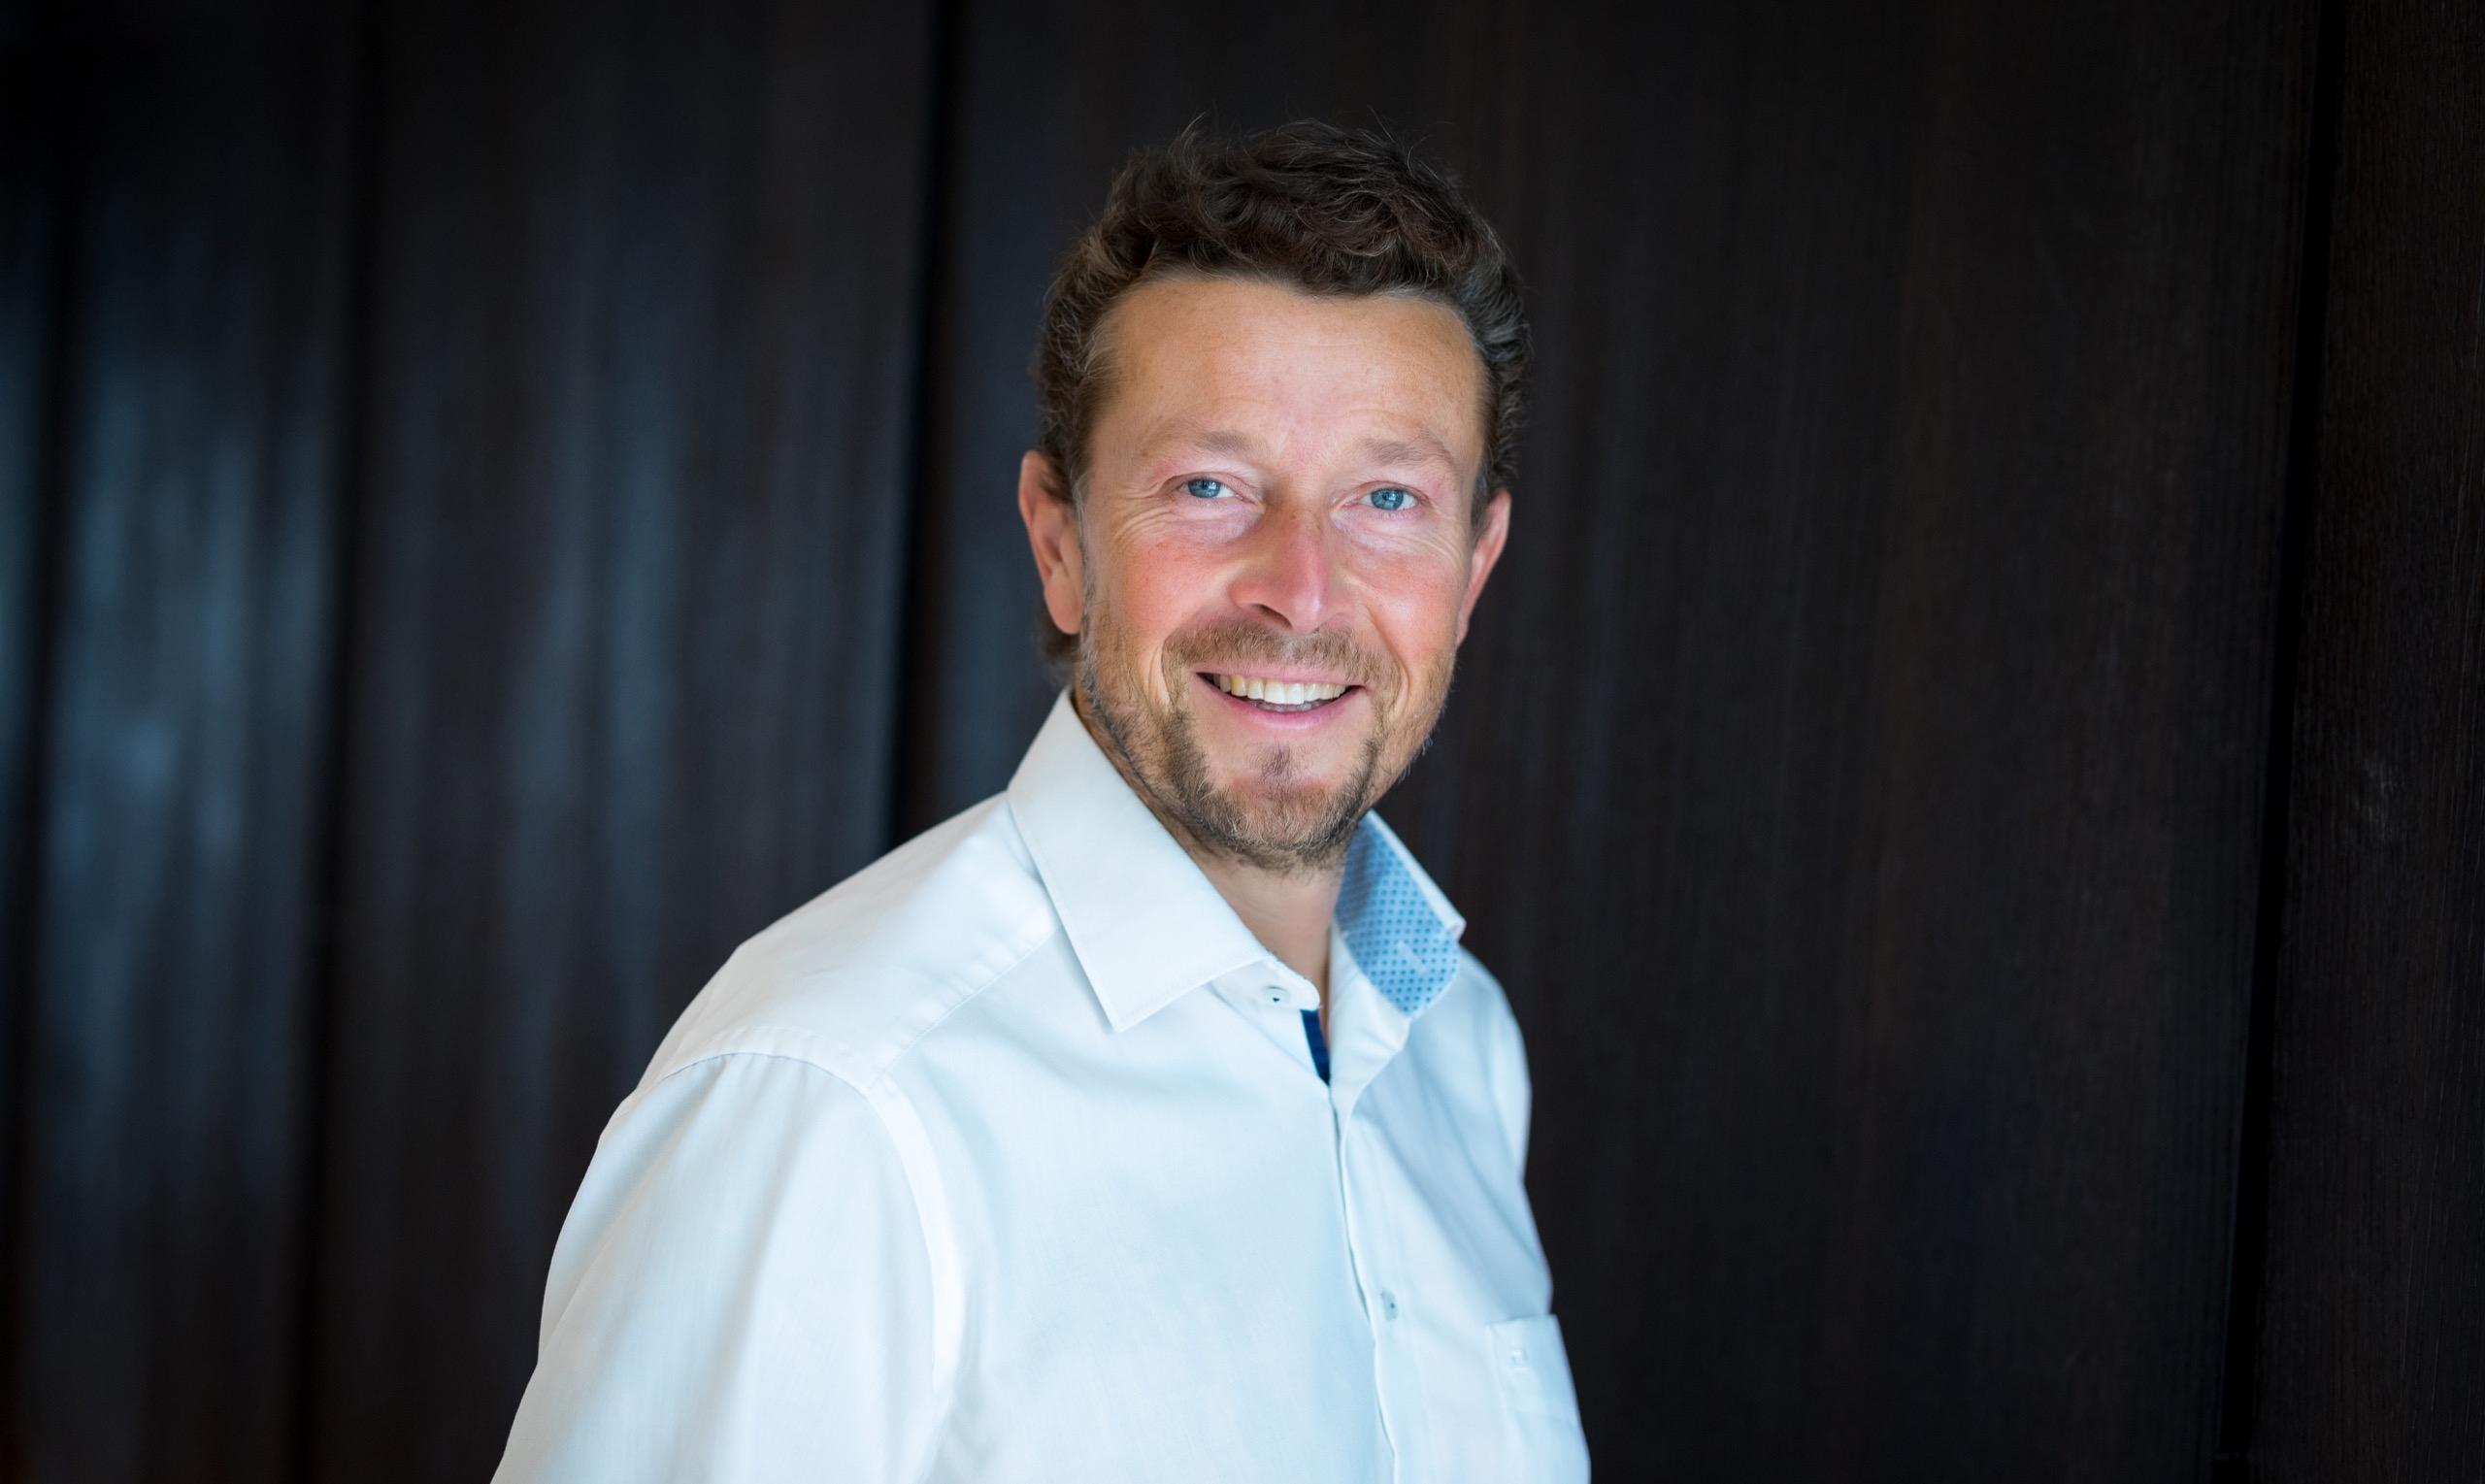 Chris Heyvaert